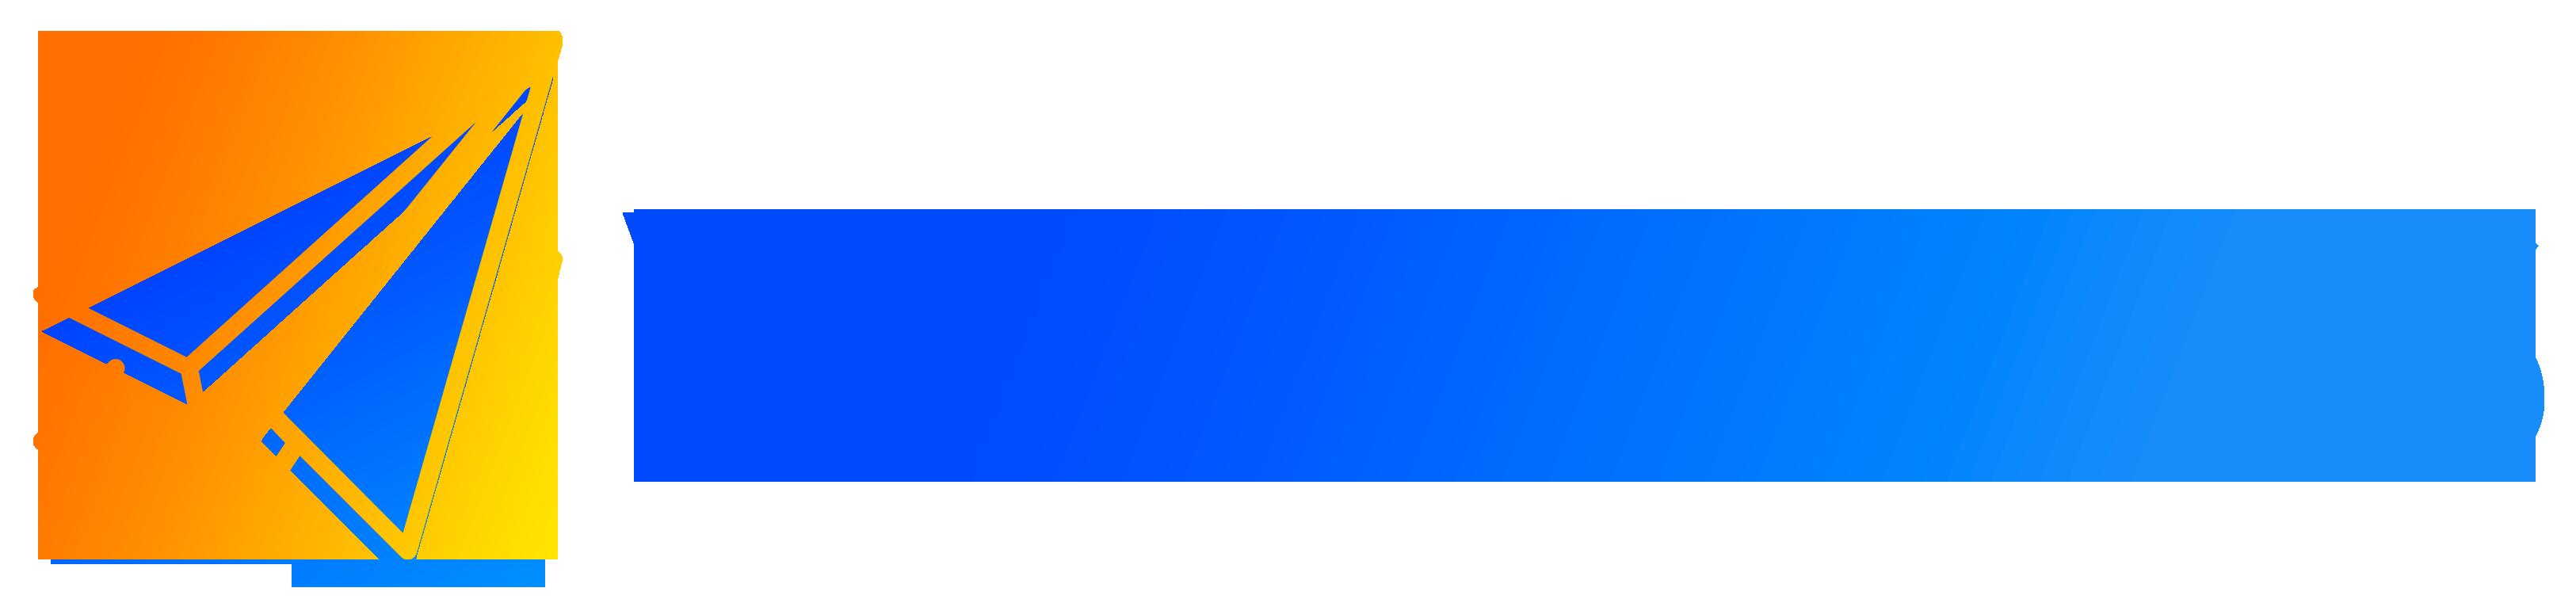 logo vavasms